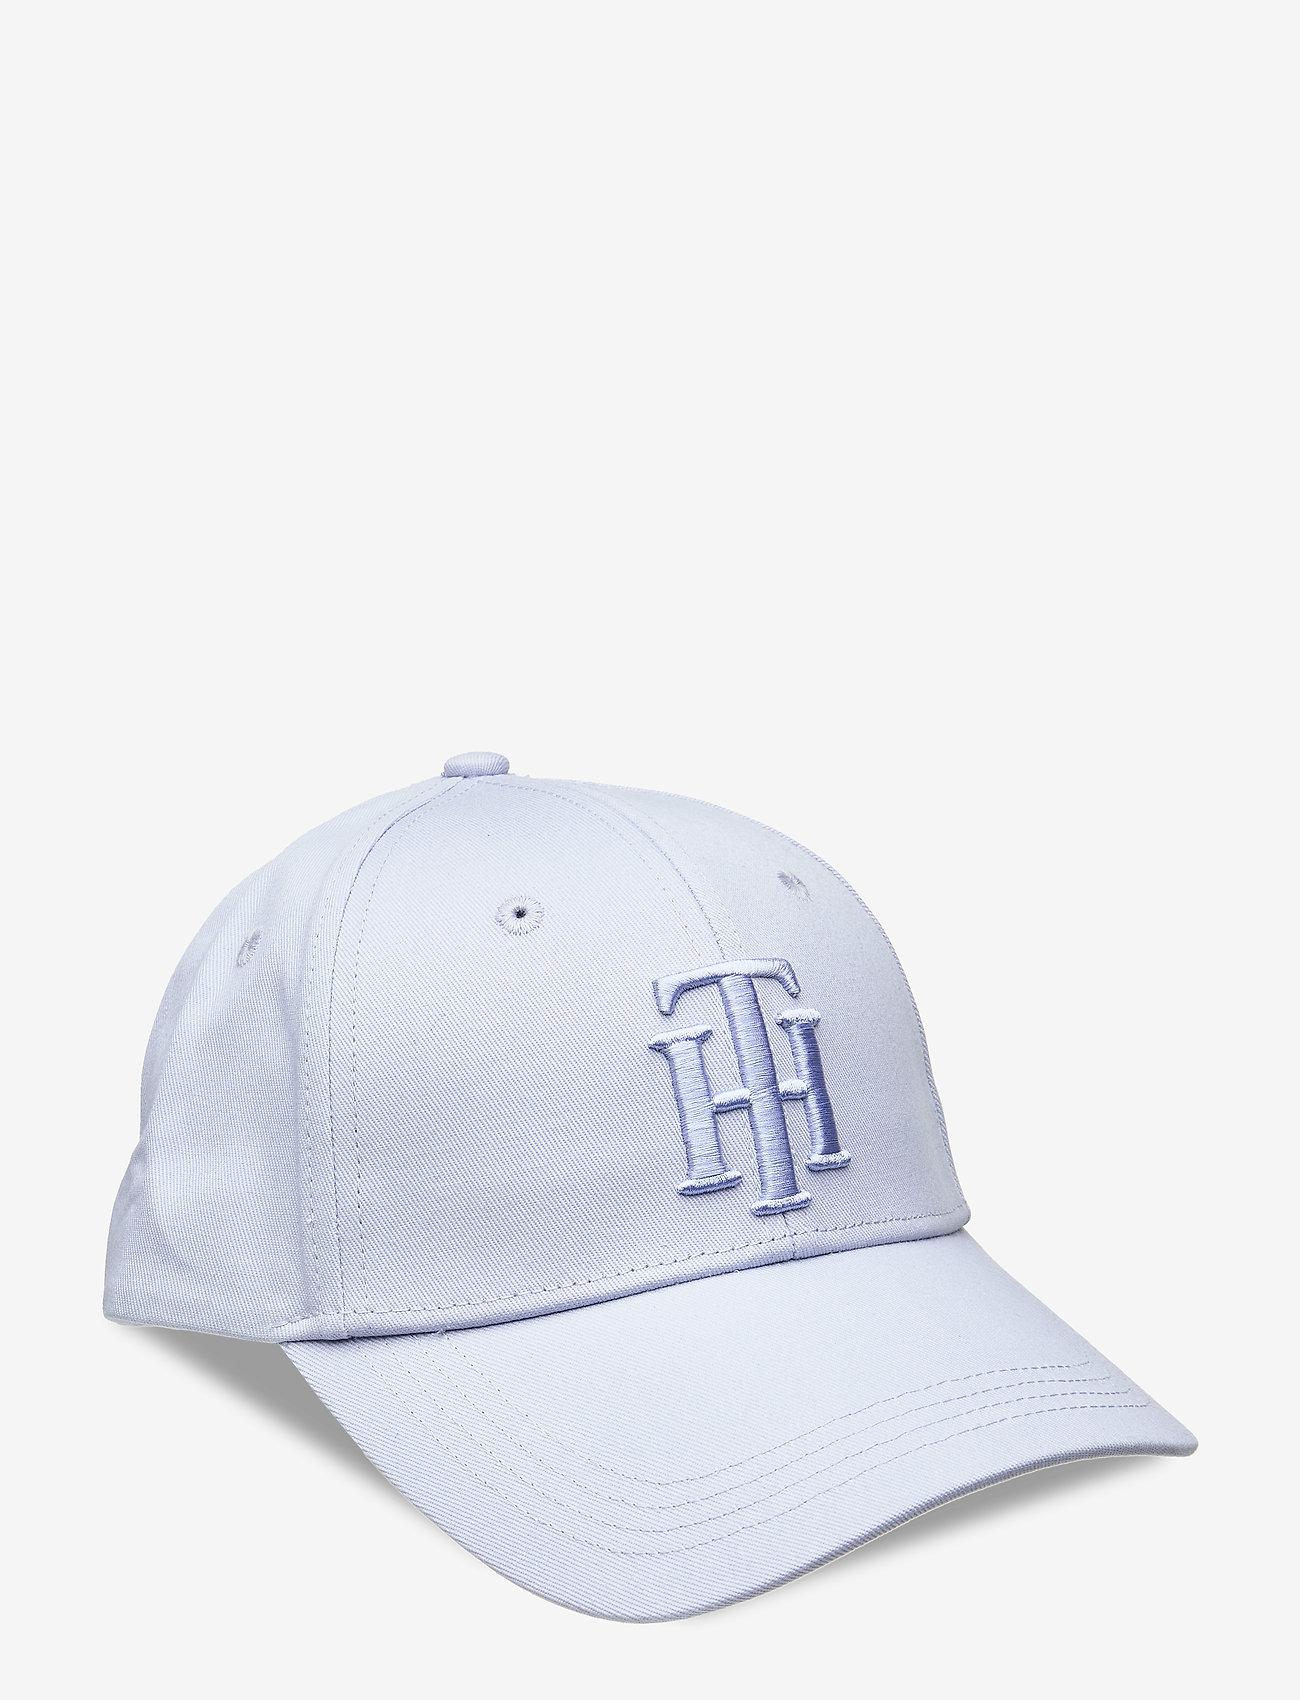 Tommy Hilfiger - TH CHIC CAP - casquettes - breezy blue - 0